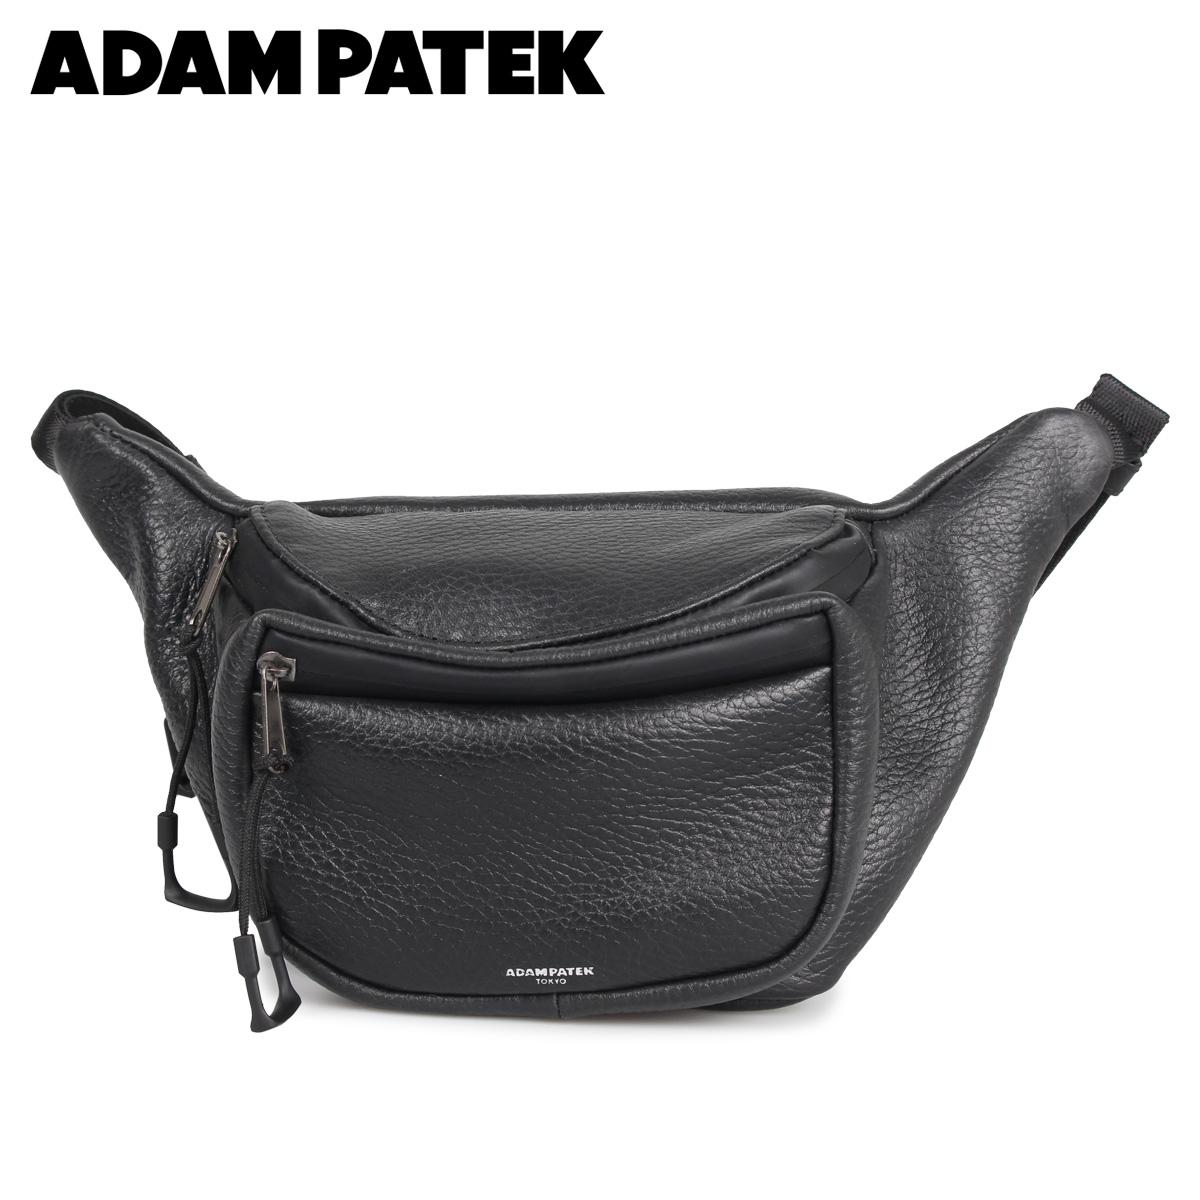 ADAM PATEK アダムパテック バッグ ウエストバッグ ボディバッグ メンズ レディース BALLARD ブラック 黒 AMPK-B064